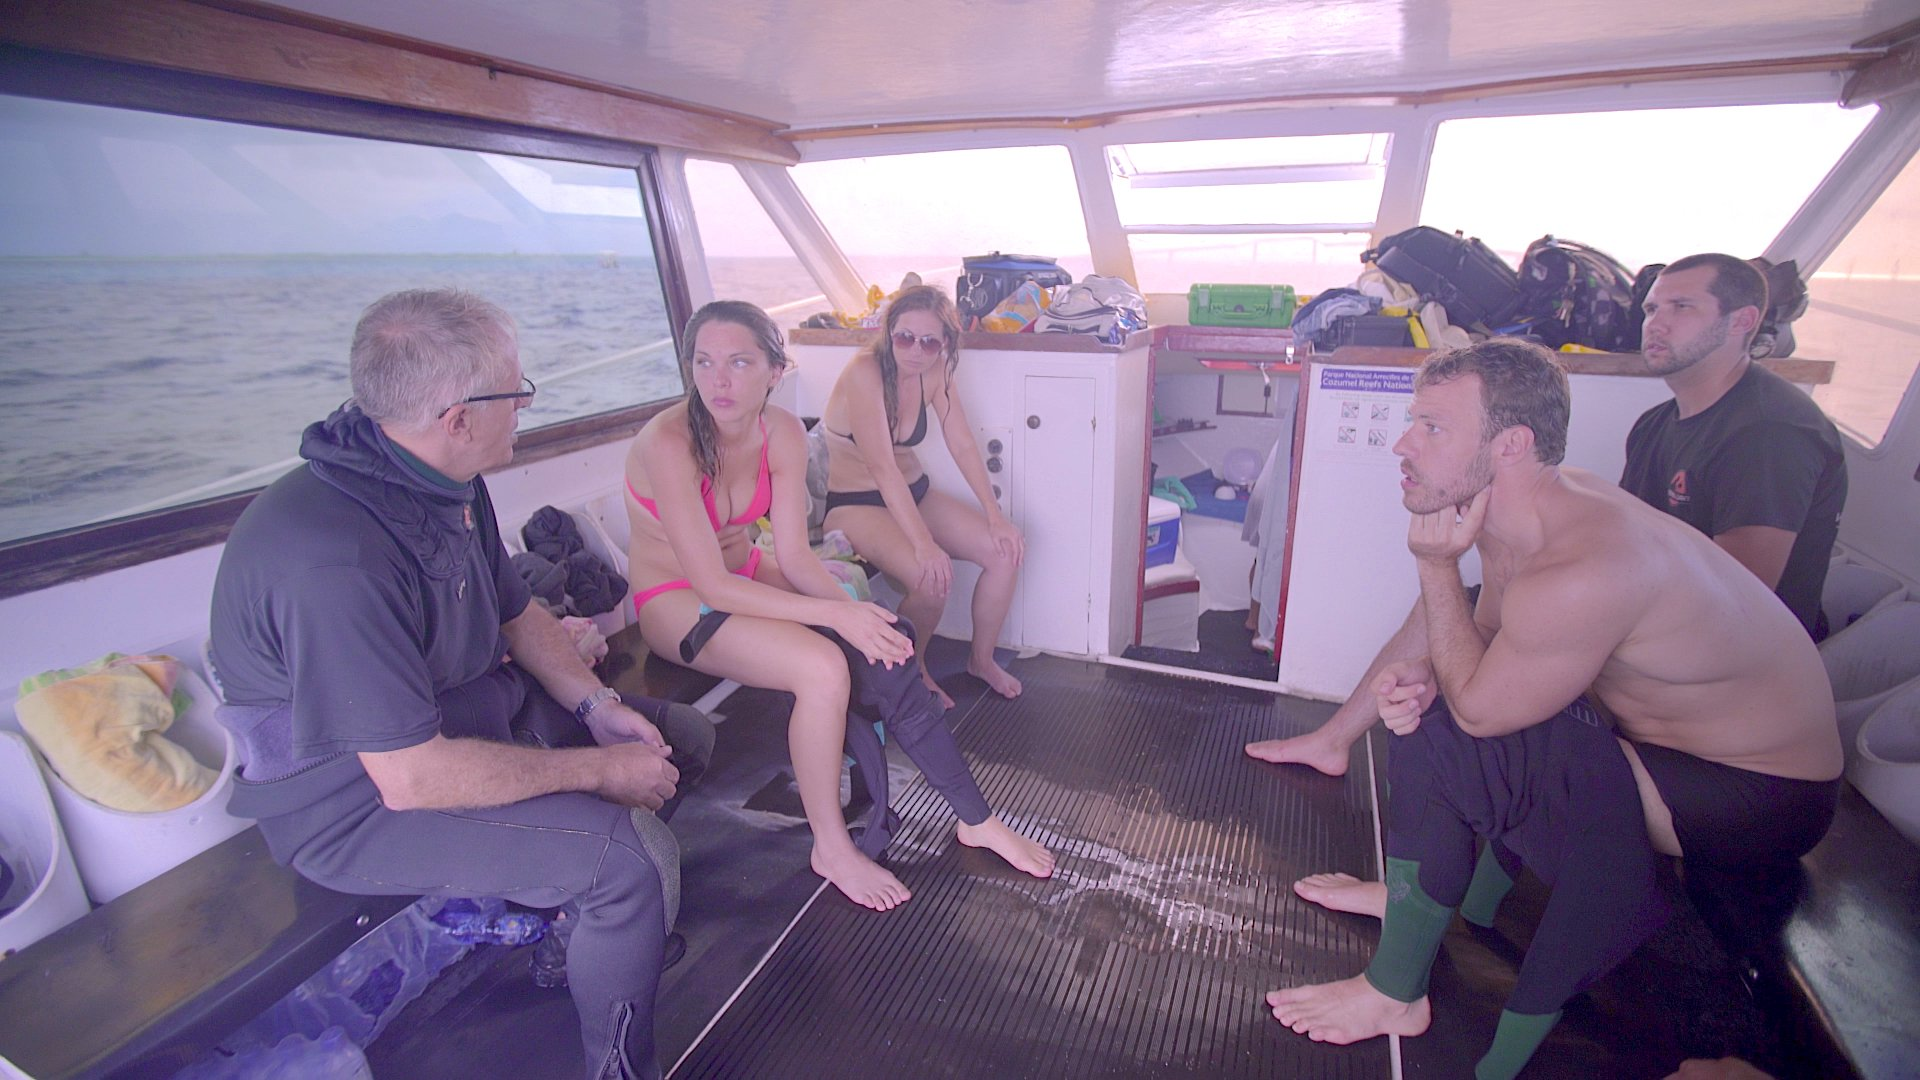 Kat Green, Falk Hentschel, Kimberly Leemans, Blake Christian, and Guy Chaumette in The Big Swim (2016)